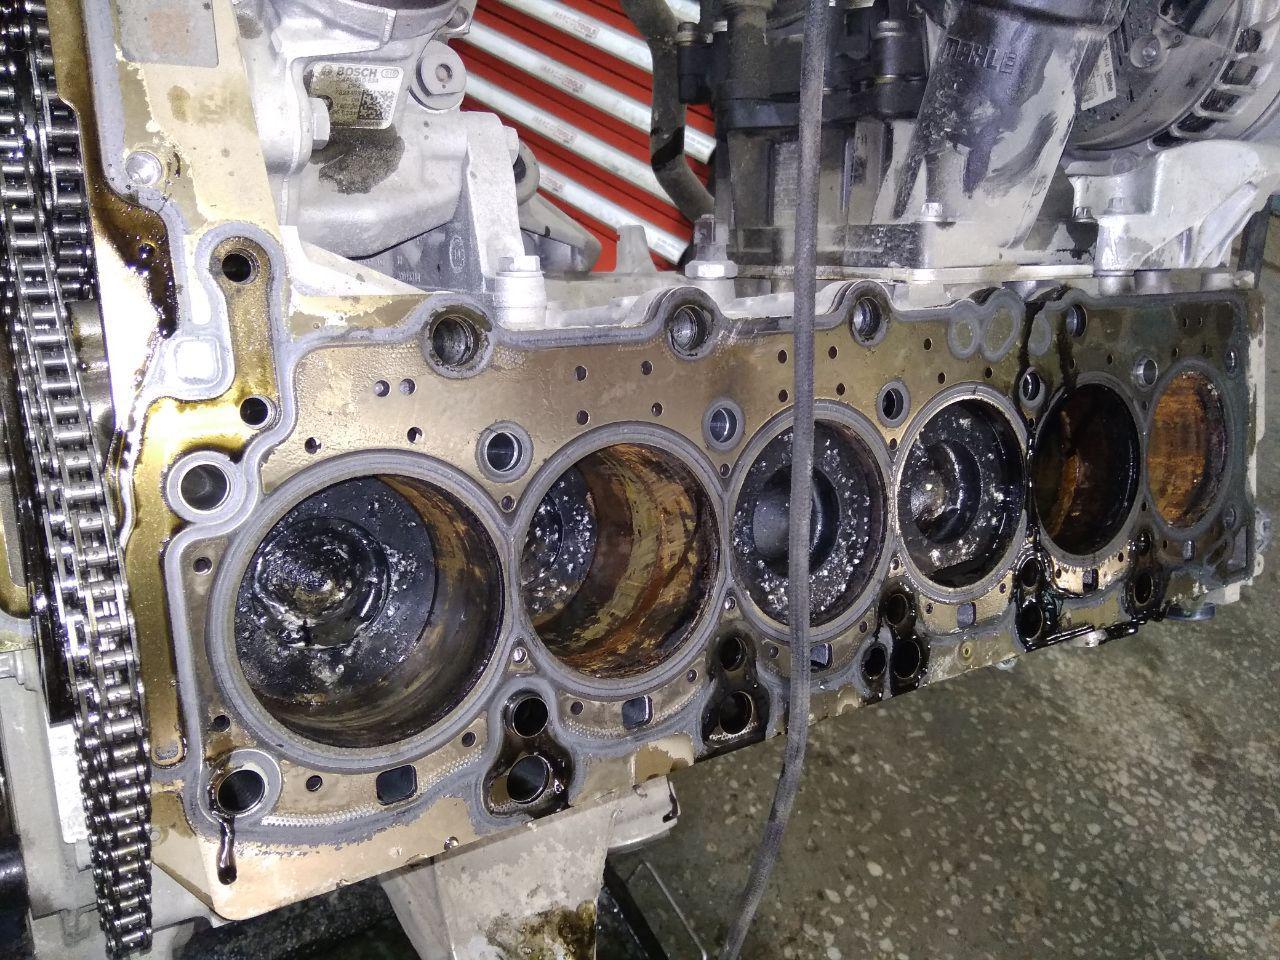 двигатель получил гидроудар